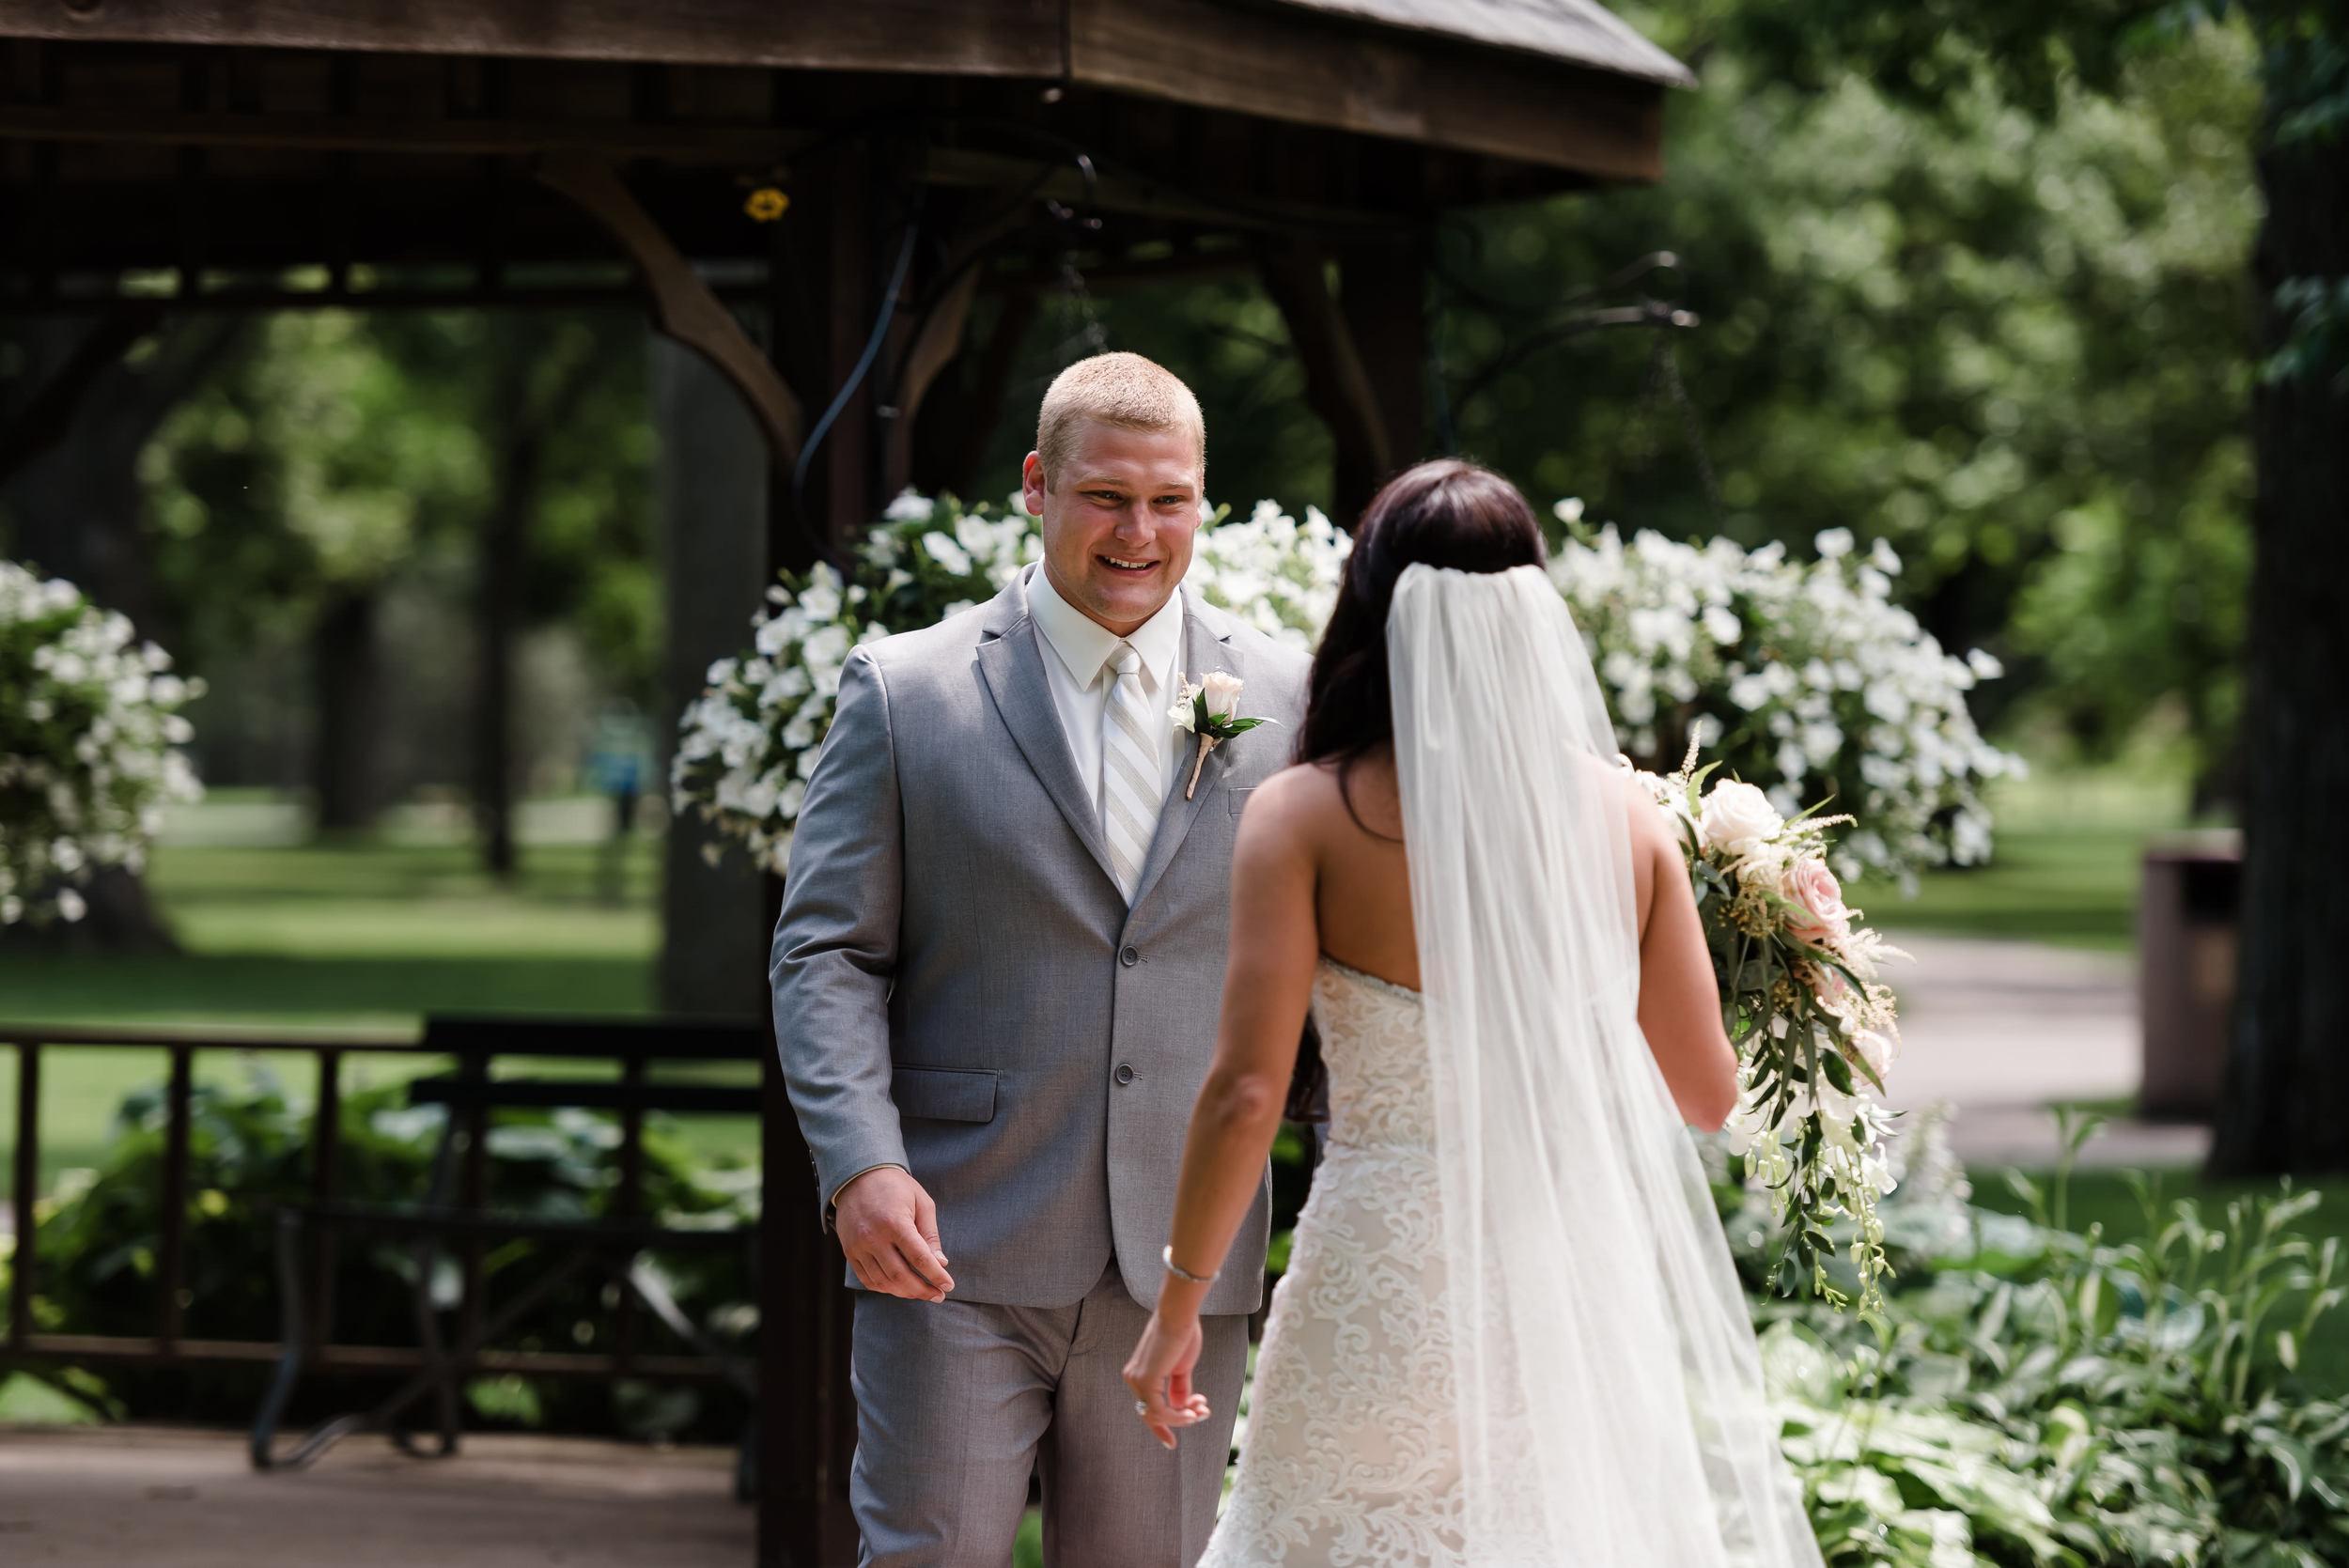 Layce and Brandon - Wedding - First Look-12.jpg